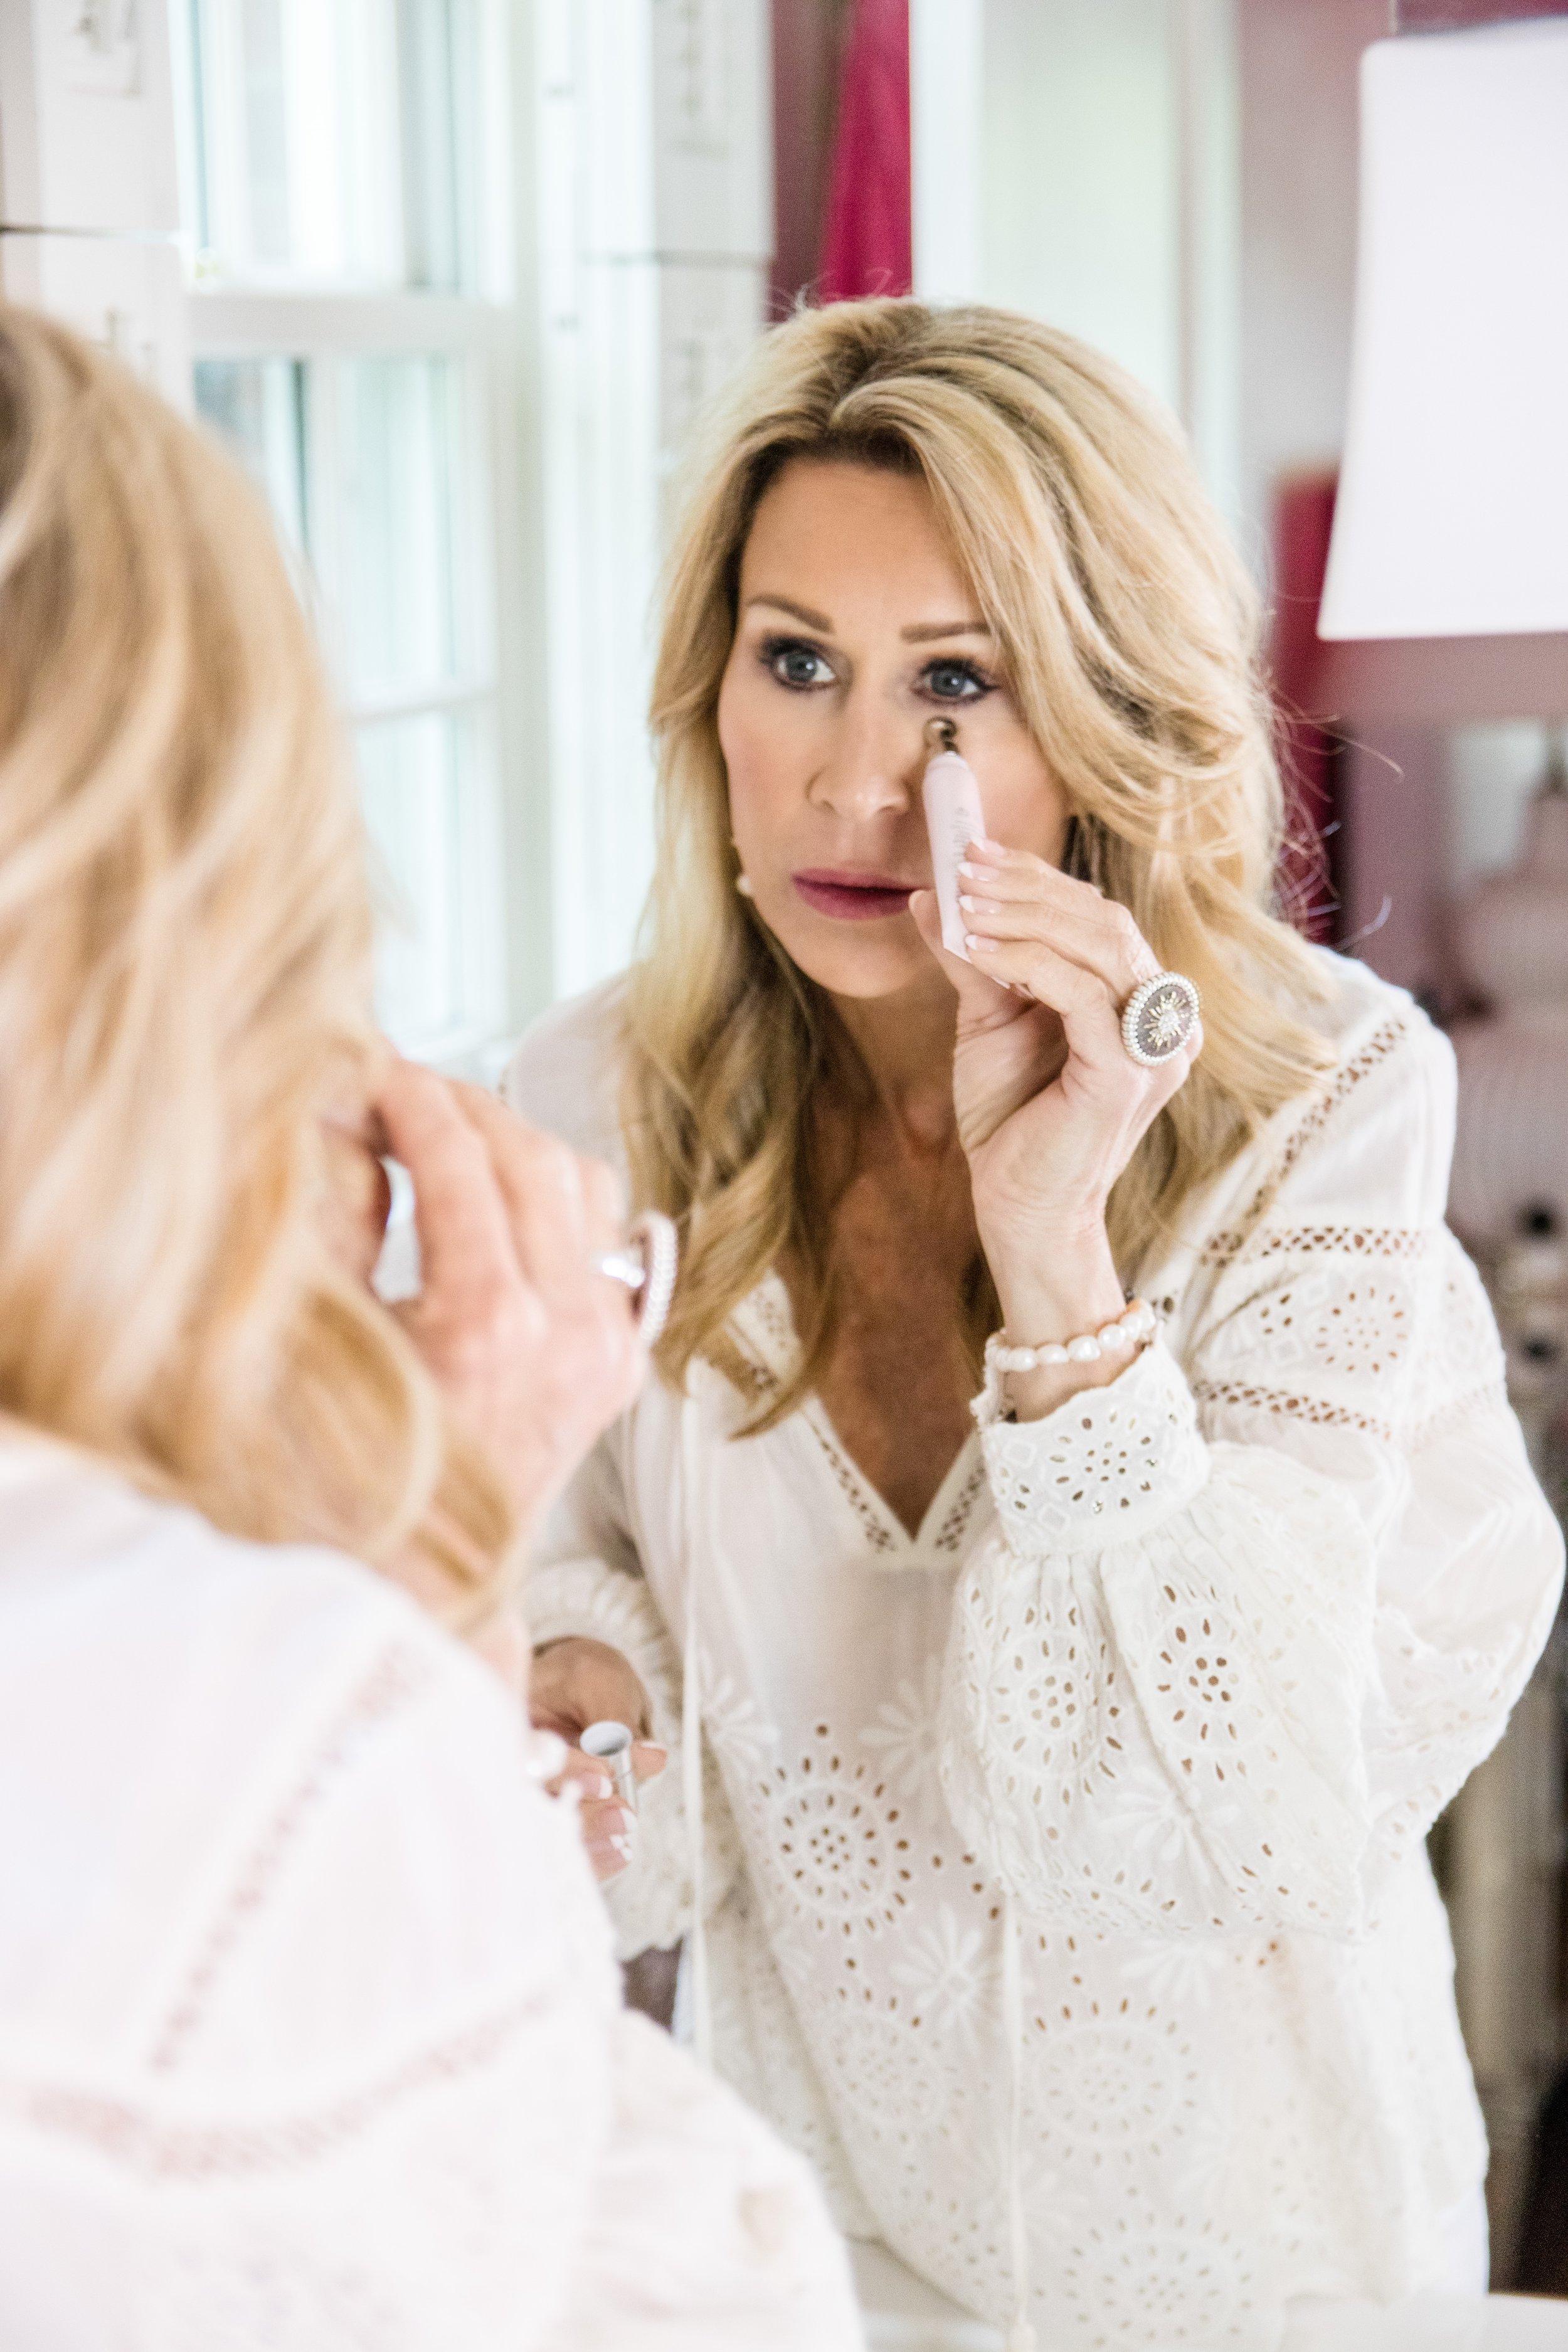 Skinn Cosmetics - Crazy Blonde Life